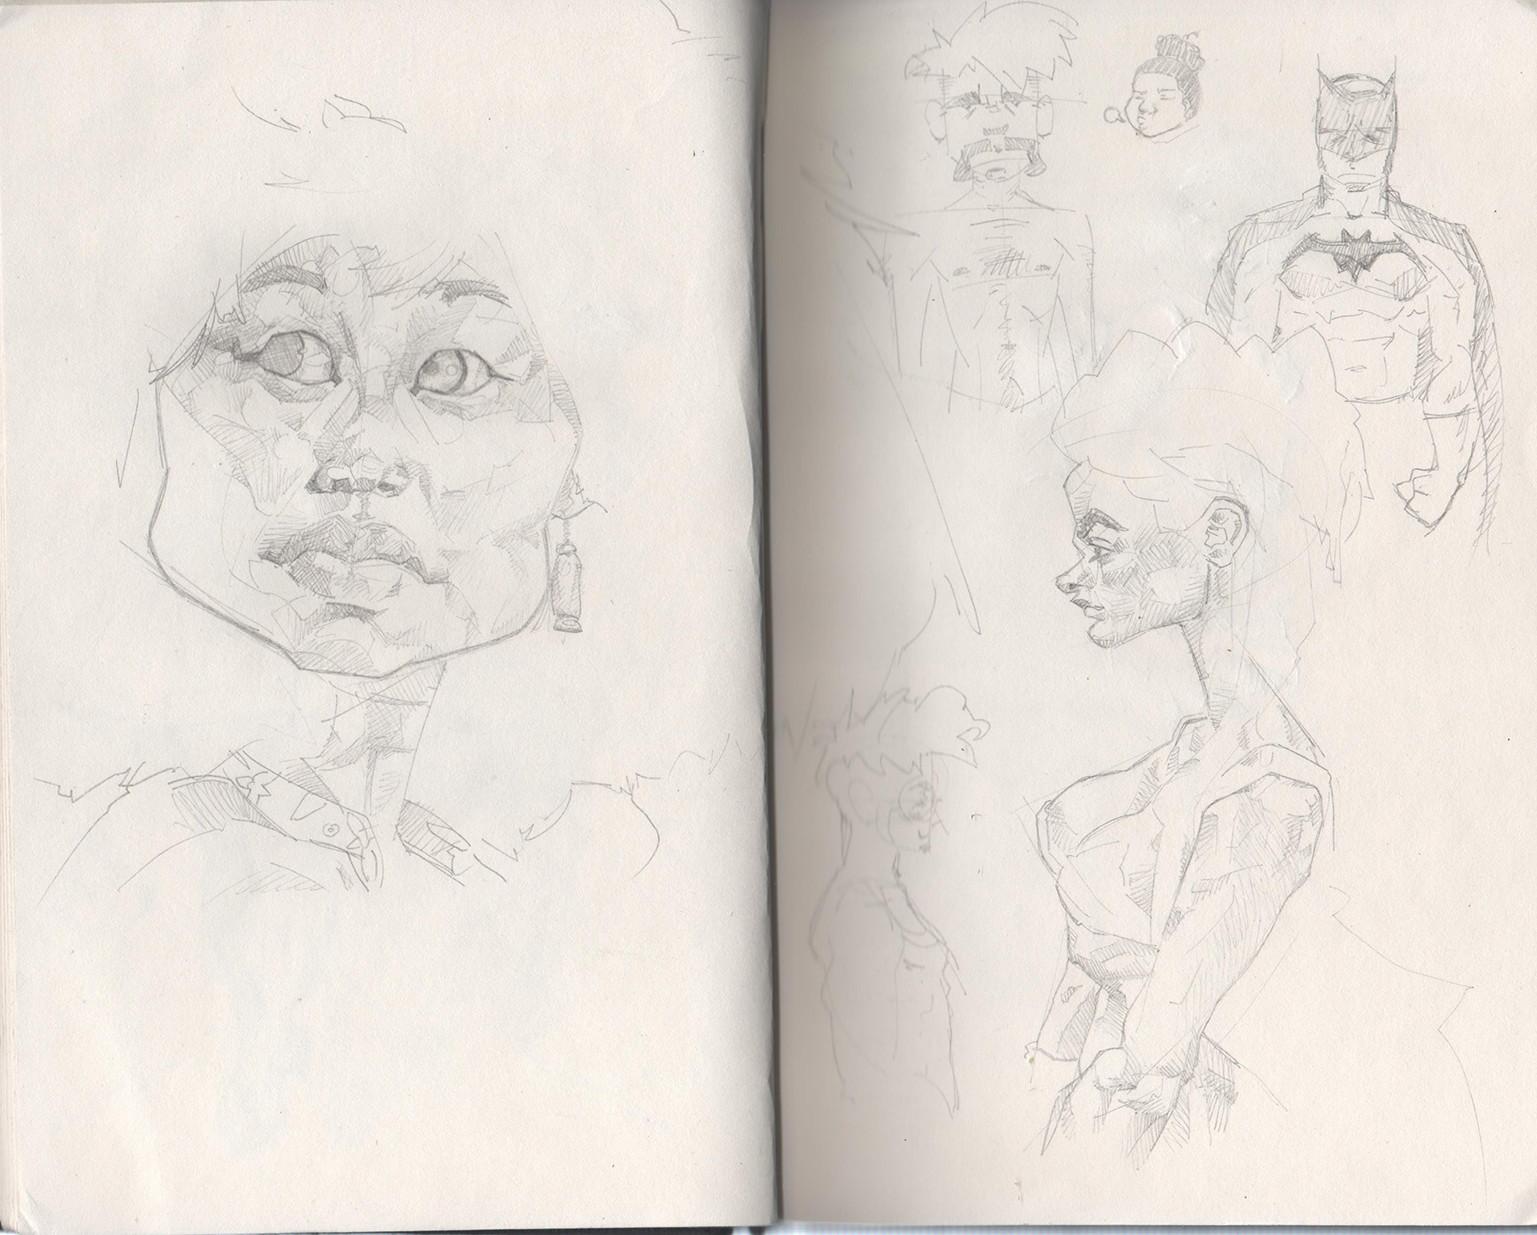 Tony gbeulie post sketch9